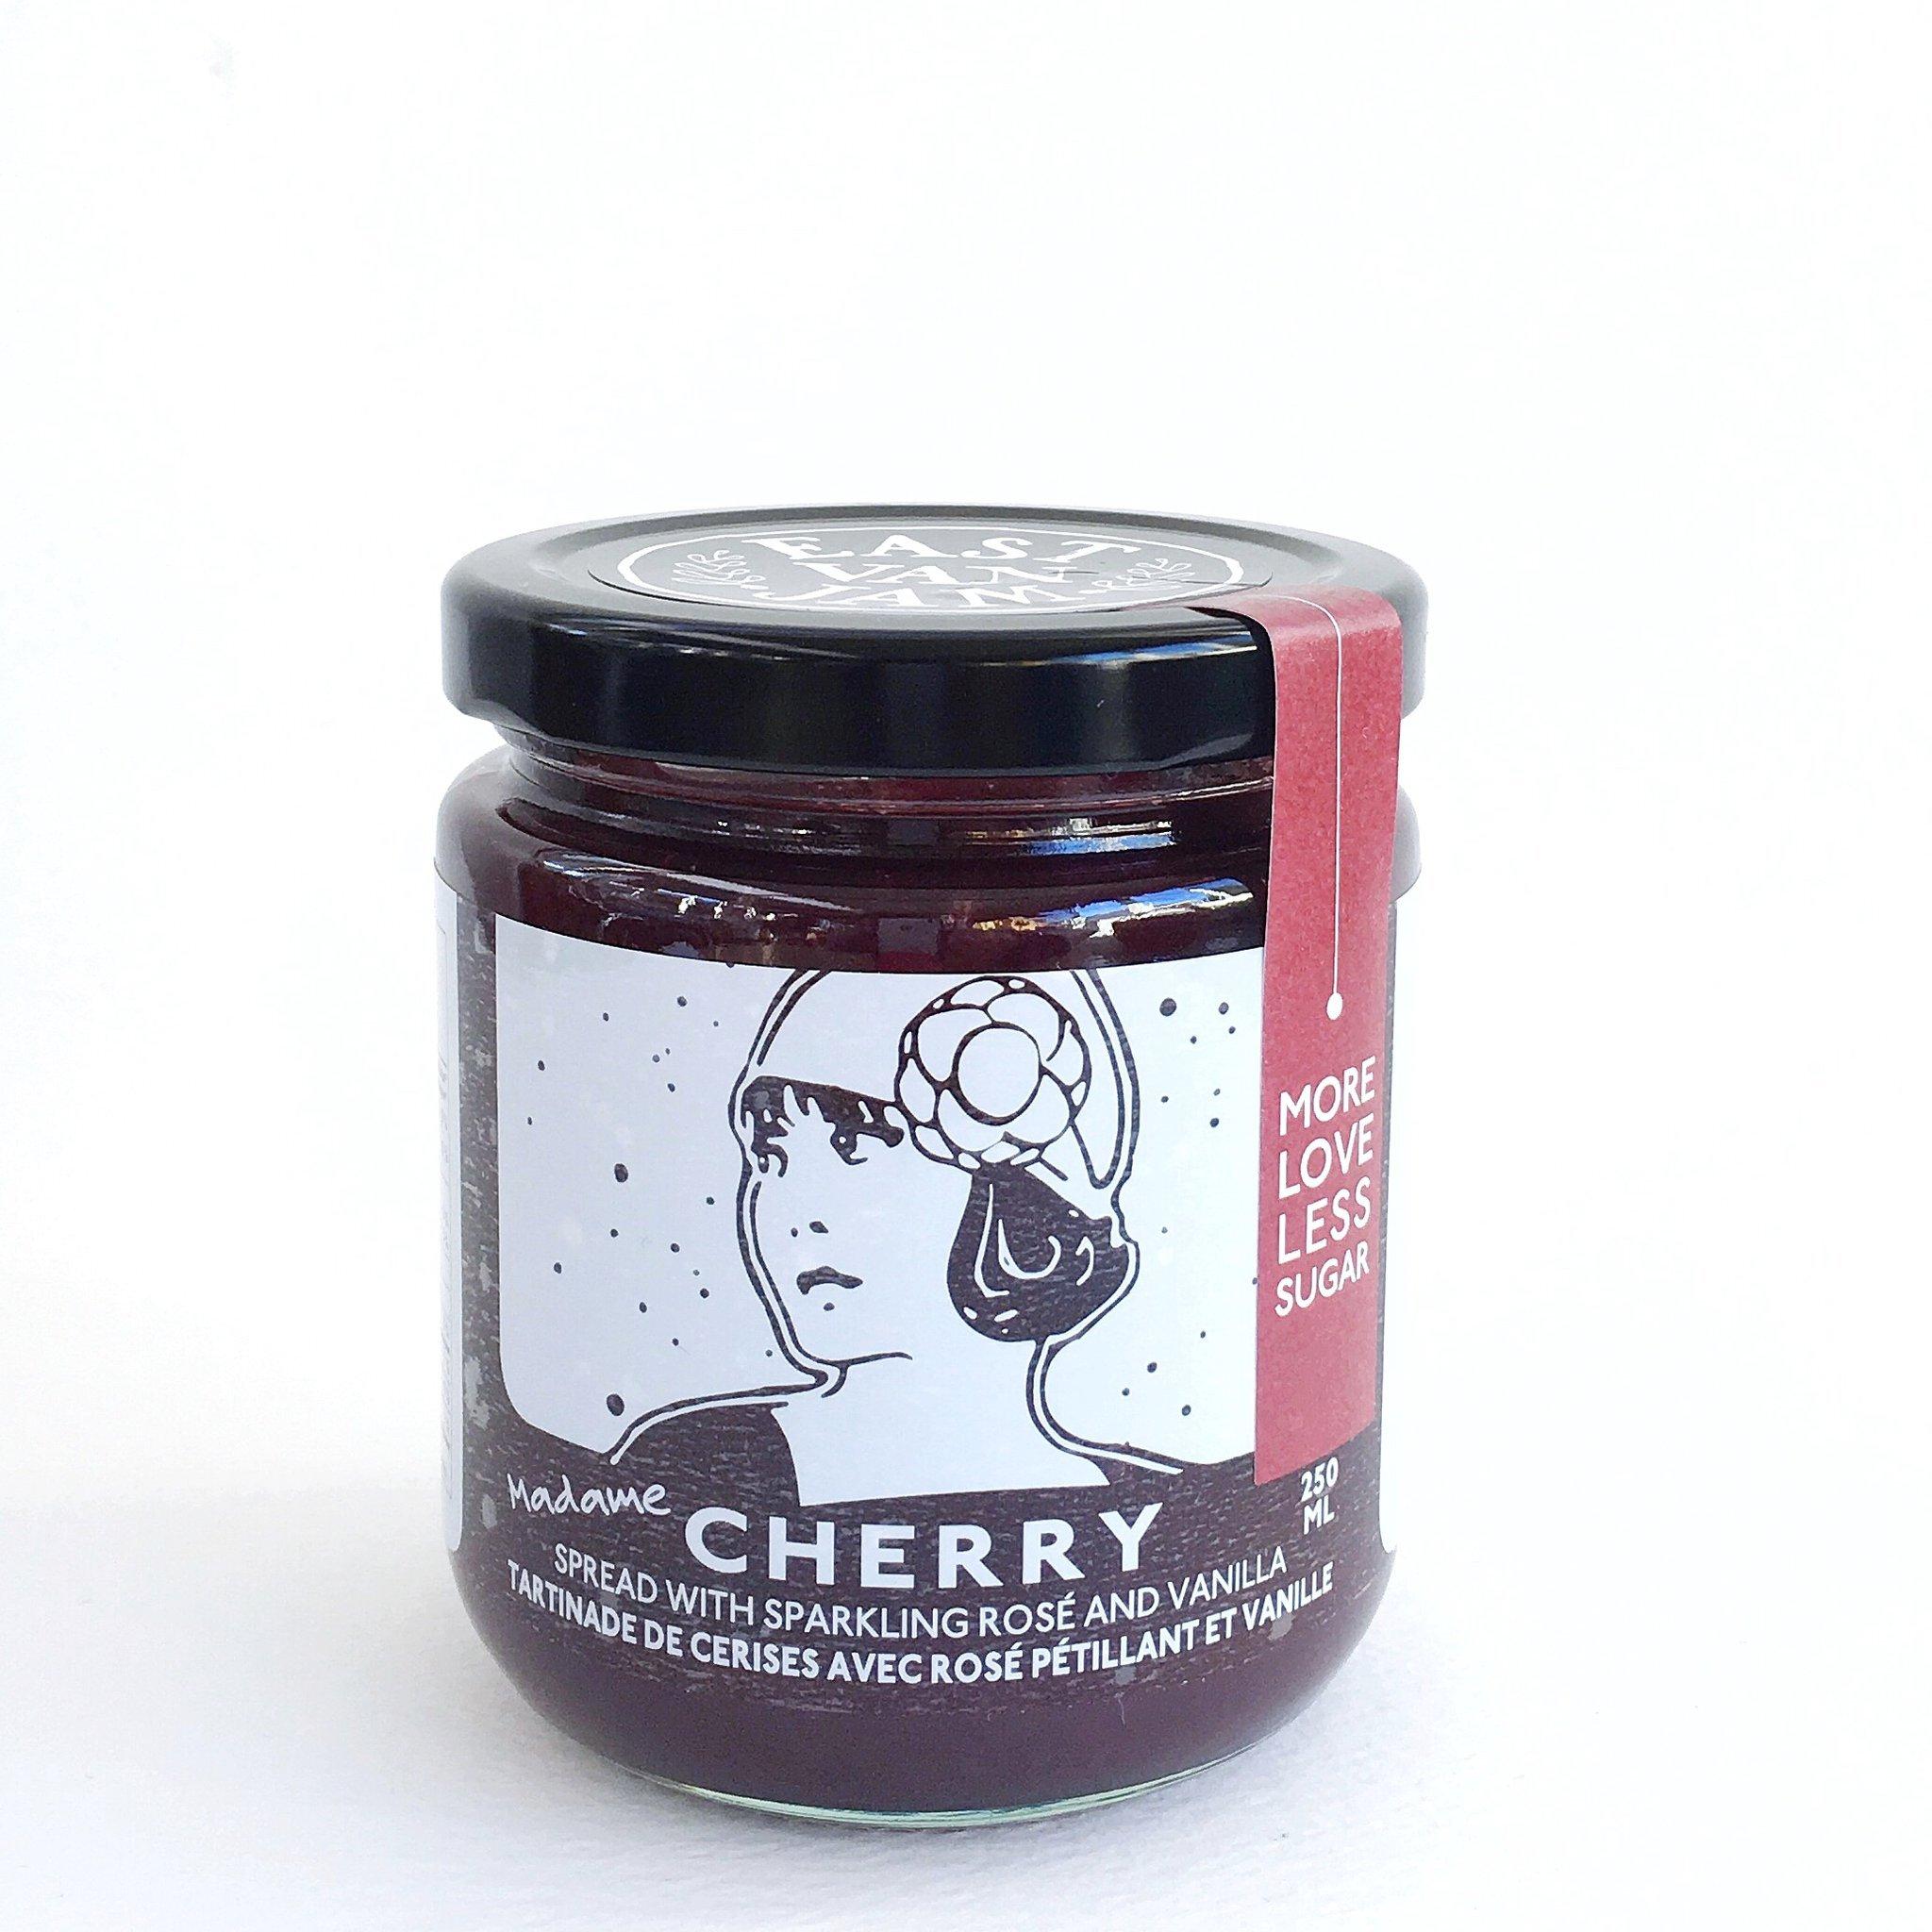 East Van Jam Cherry with Sparkling Rose + Vanilla